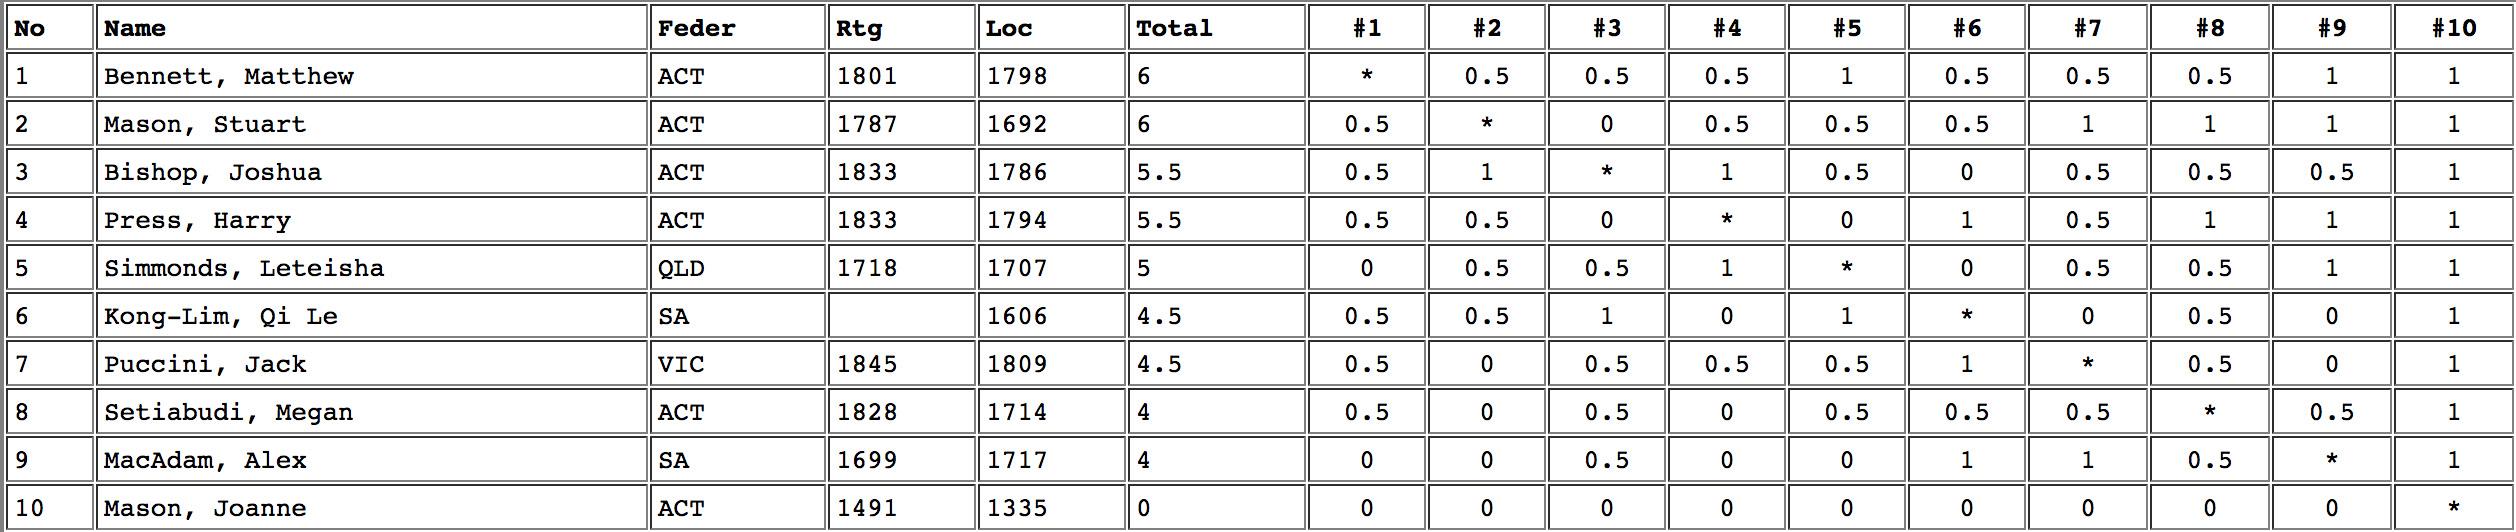 Lidums AJM 2012 Results